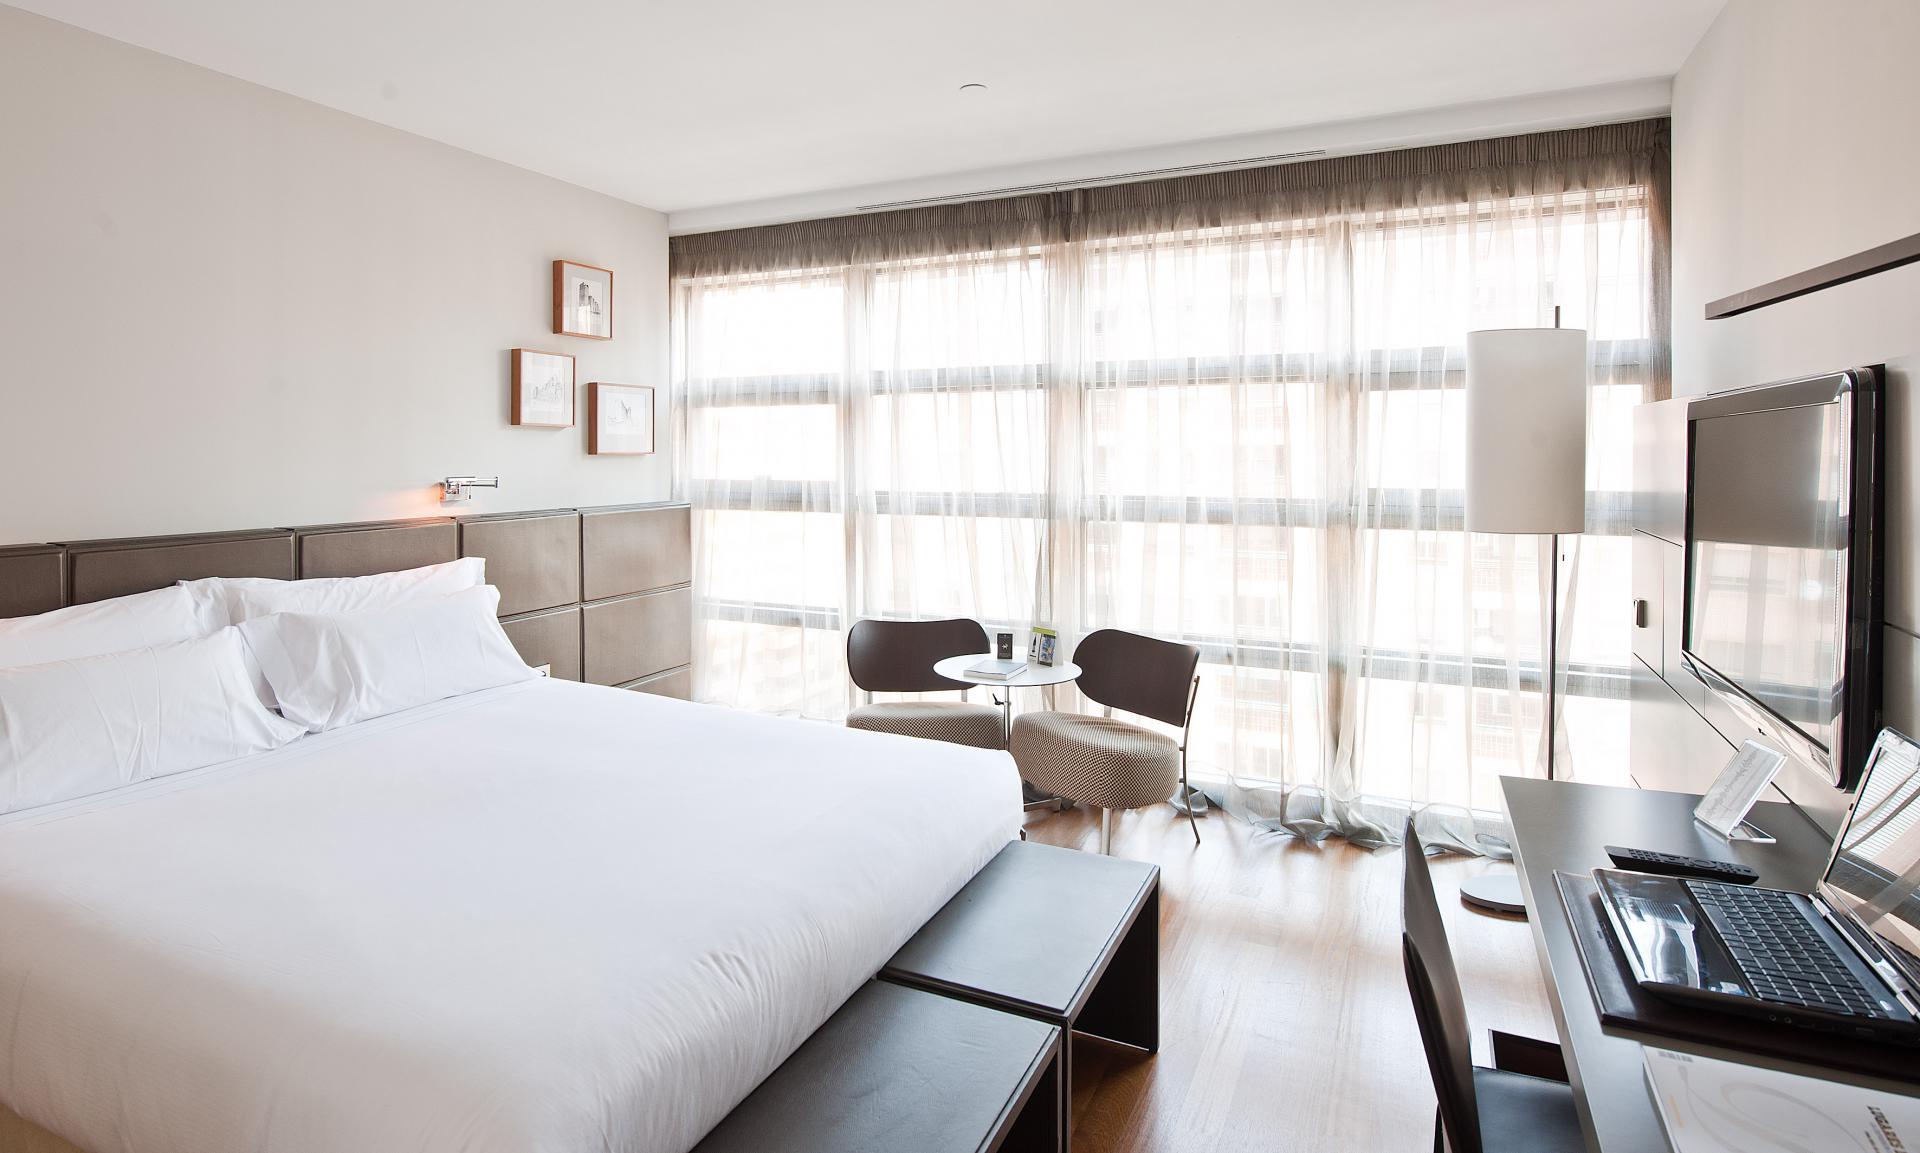 Habitaciones hotel reina petronila palafox hoteles for Hoteles con habitaciones comunicadas